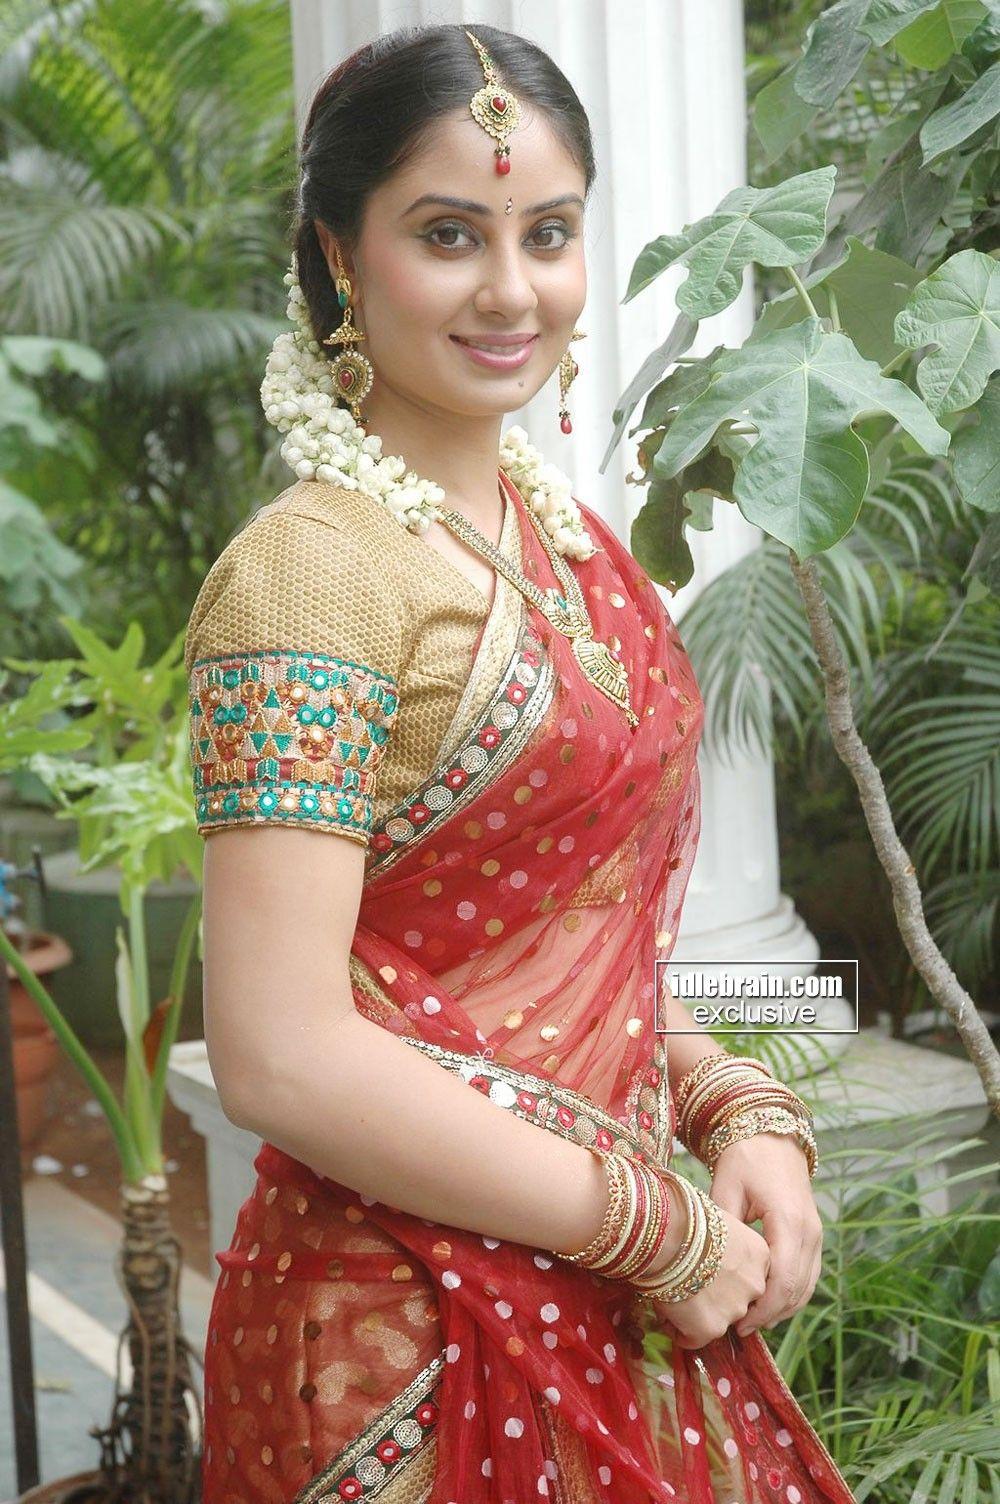 daa42a6c73 Bhanusri Mehra photo gallery - Telugu cinema actress   Indian ...